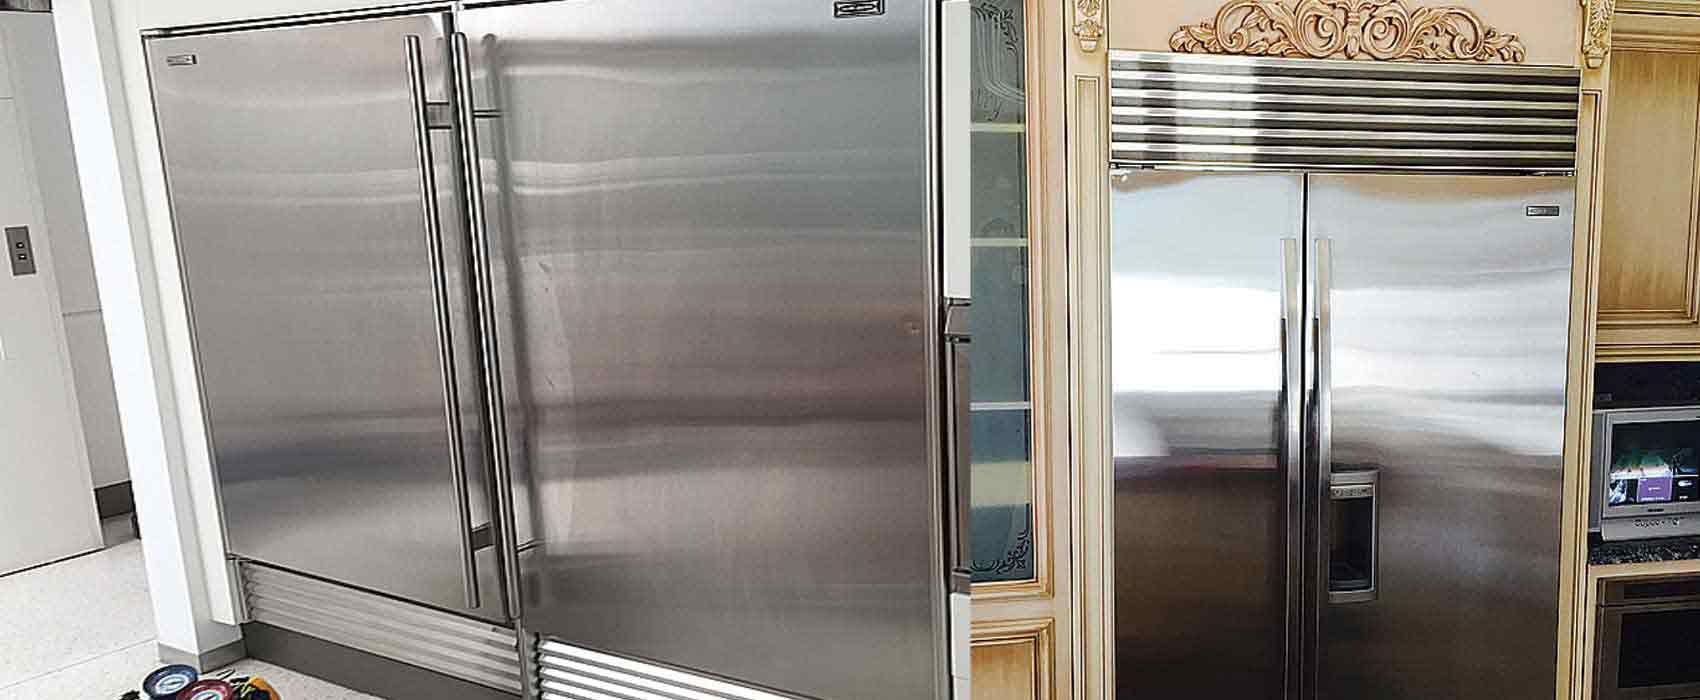 Sub Zero authorized Refrigerator Repair Service